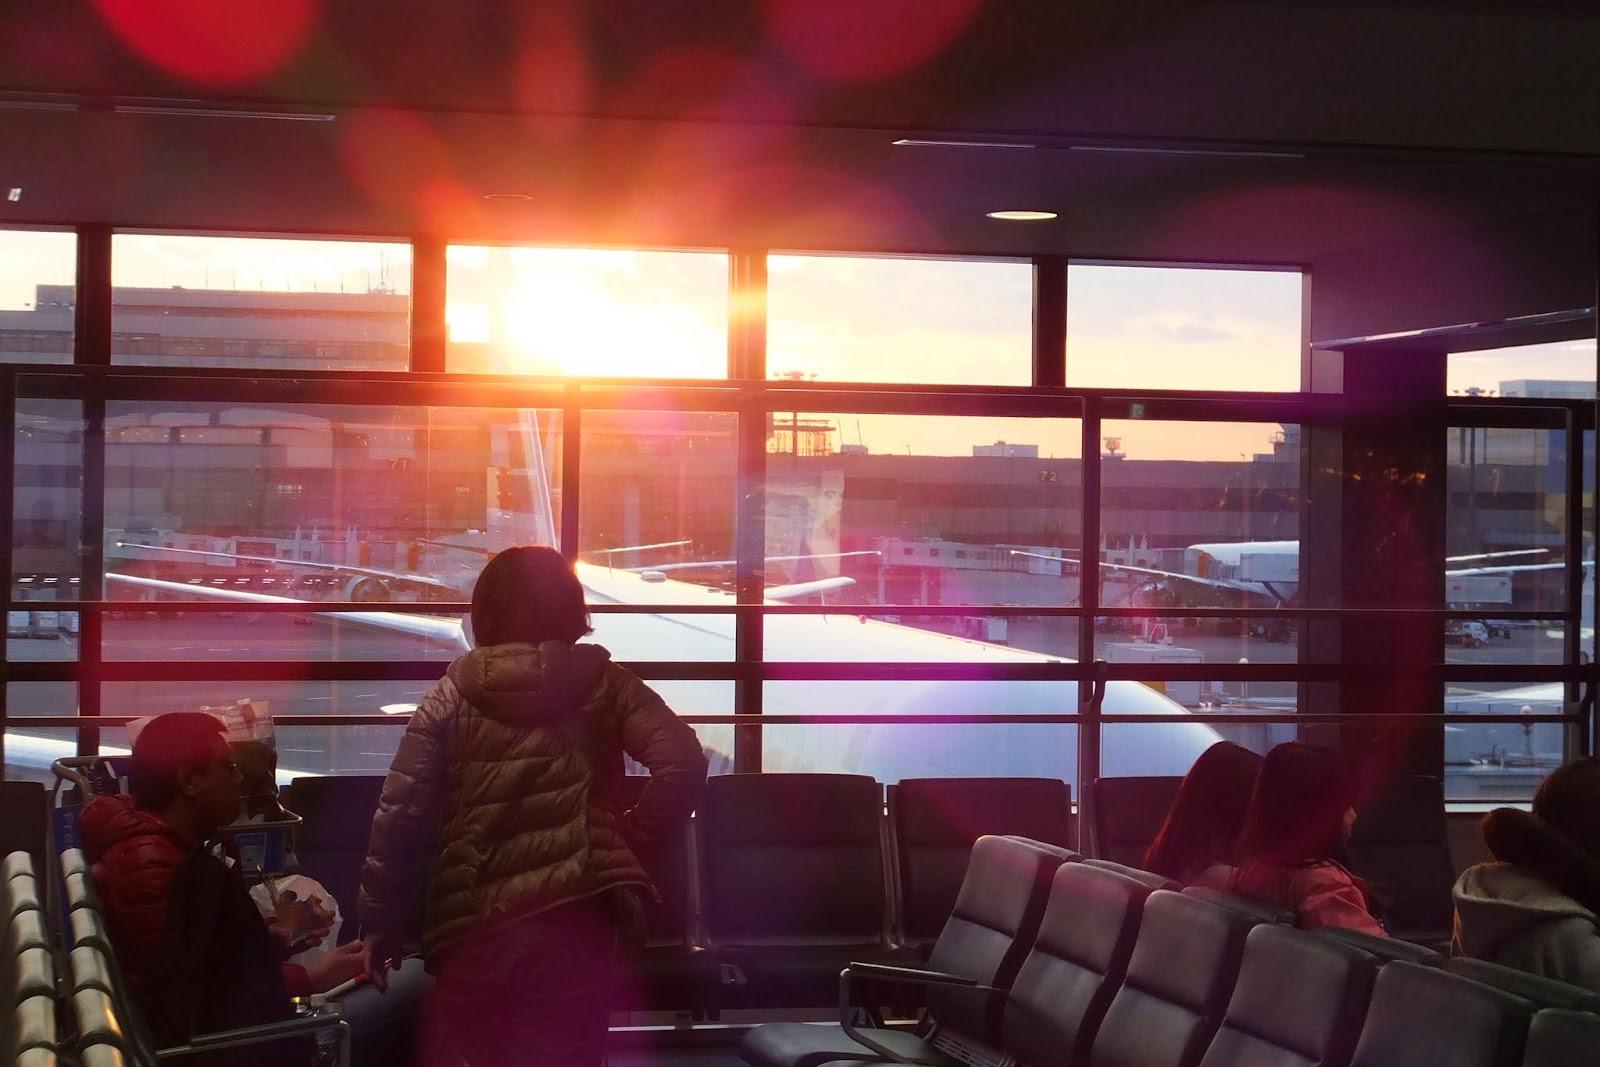 【Priority Pass】世界の有料空港ラウンジ入り放題,プライオリティパスを無料で入手 日本   244 Room